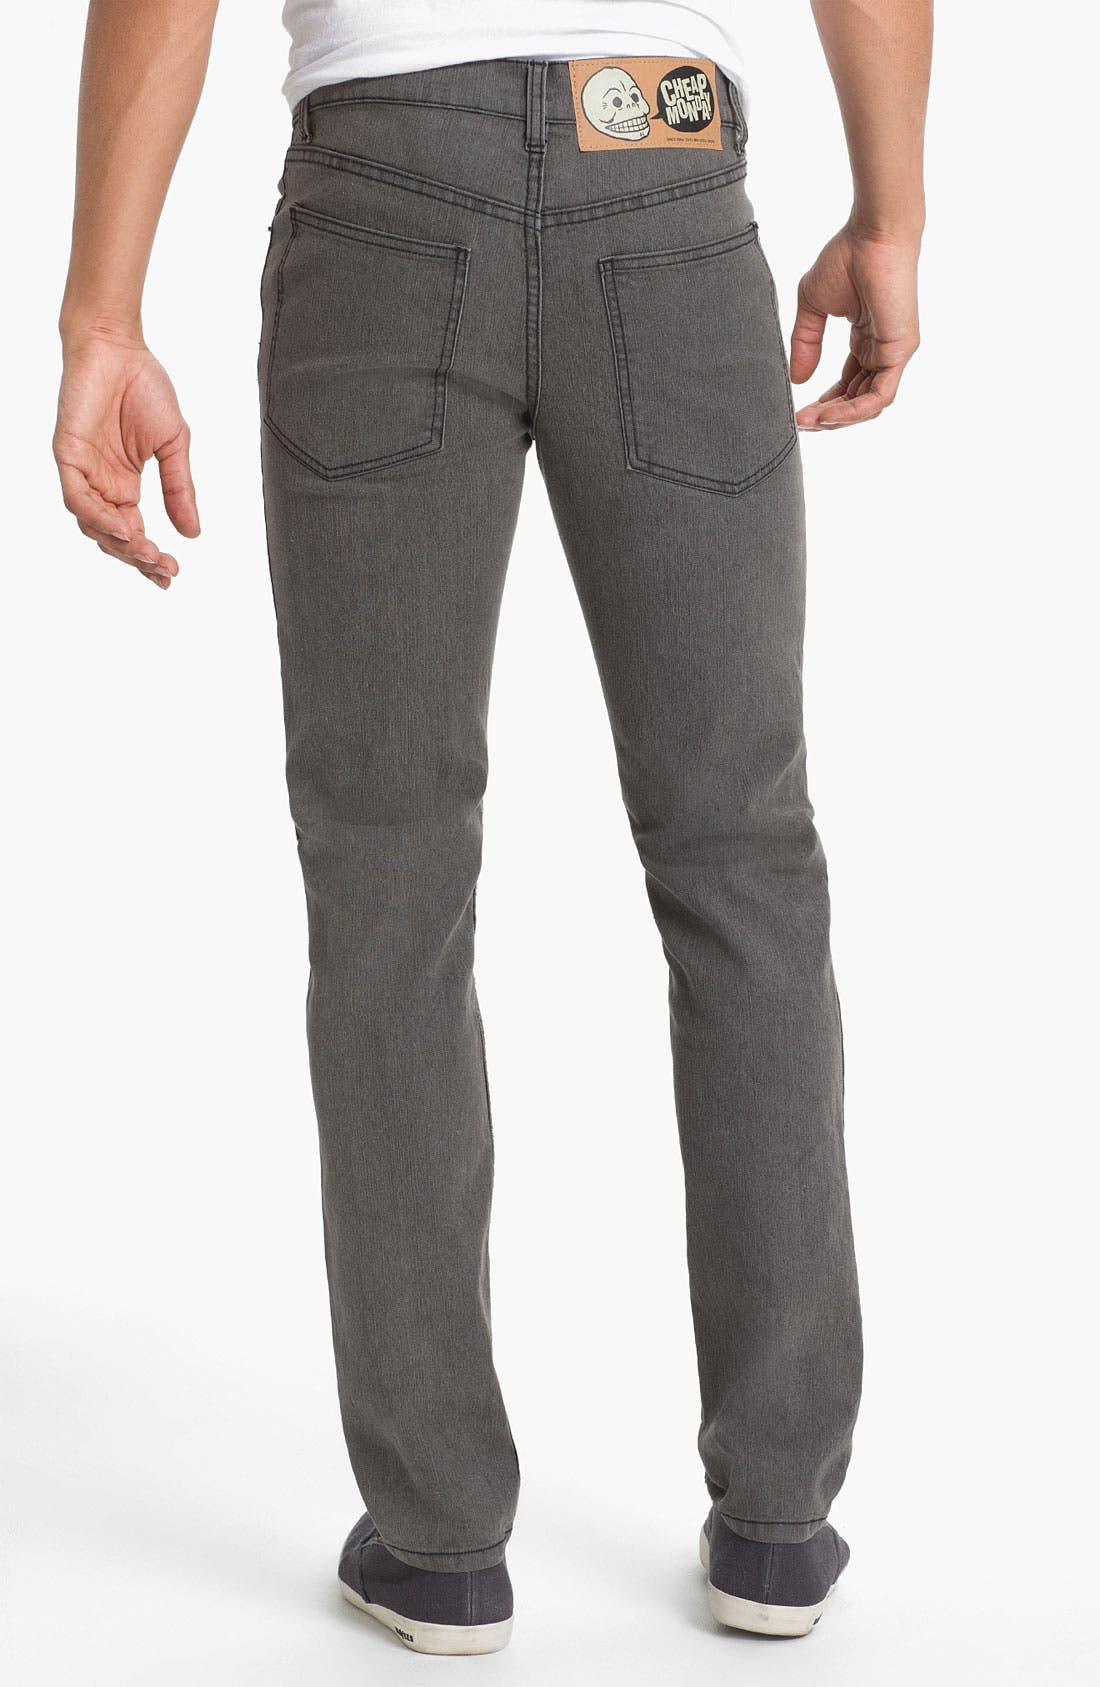 Alternate Image 1 Selected - Cheap Monday Tight Skinny Leg Jeans (45-Minute Stonewash)